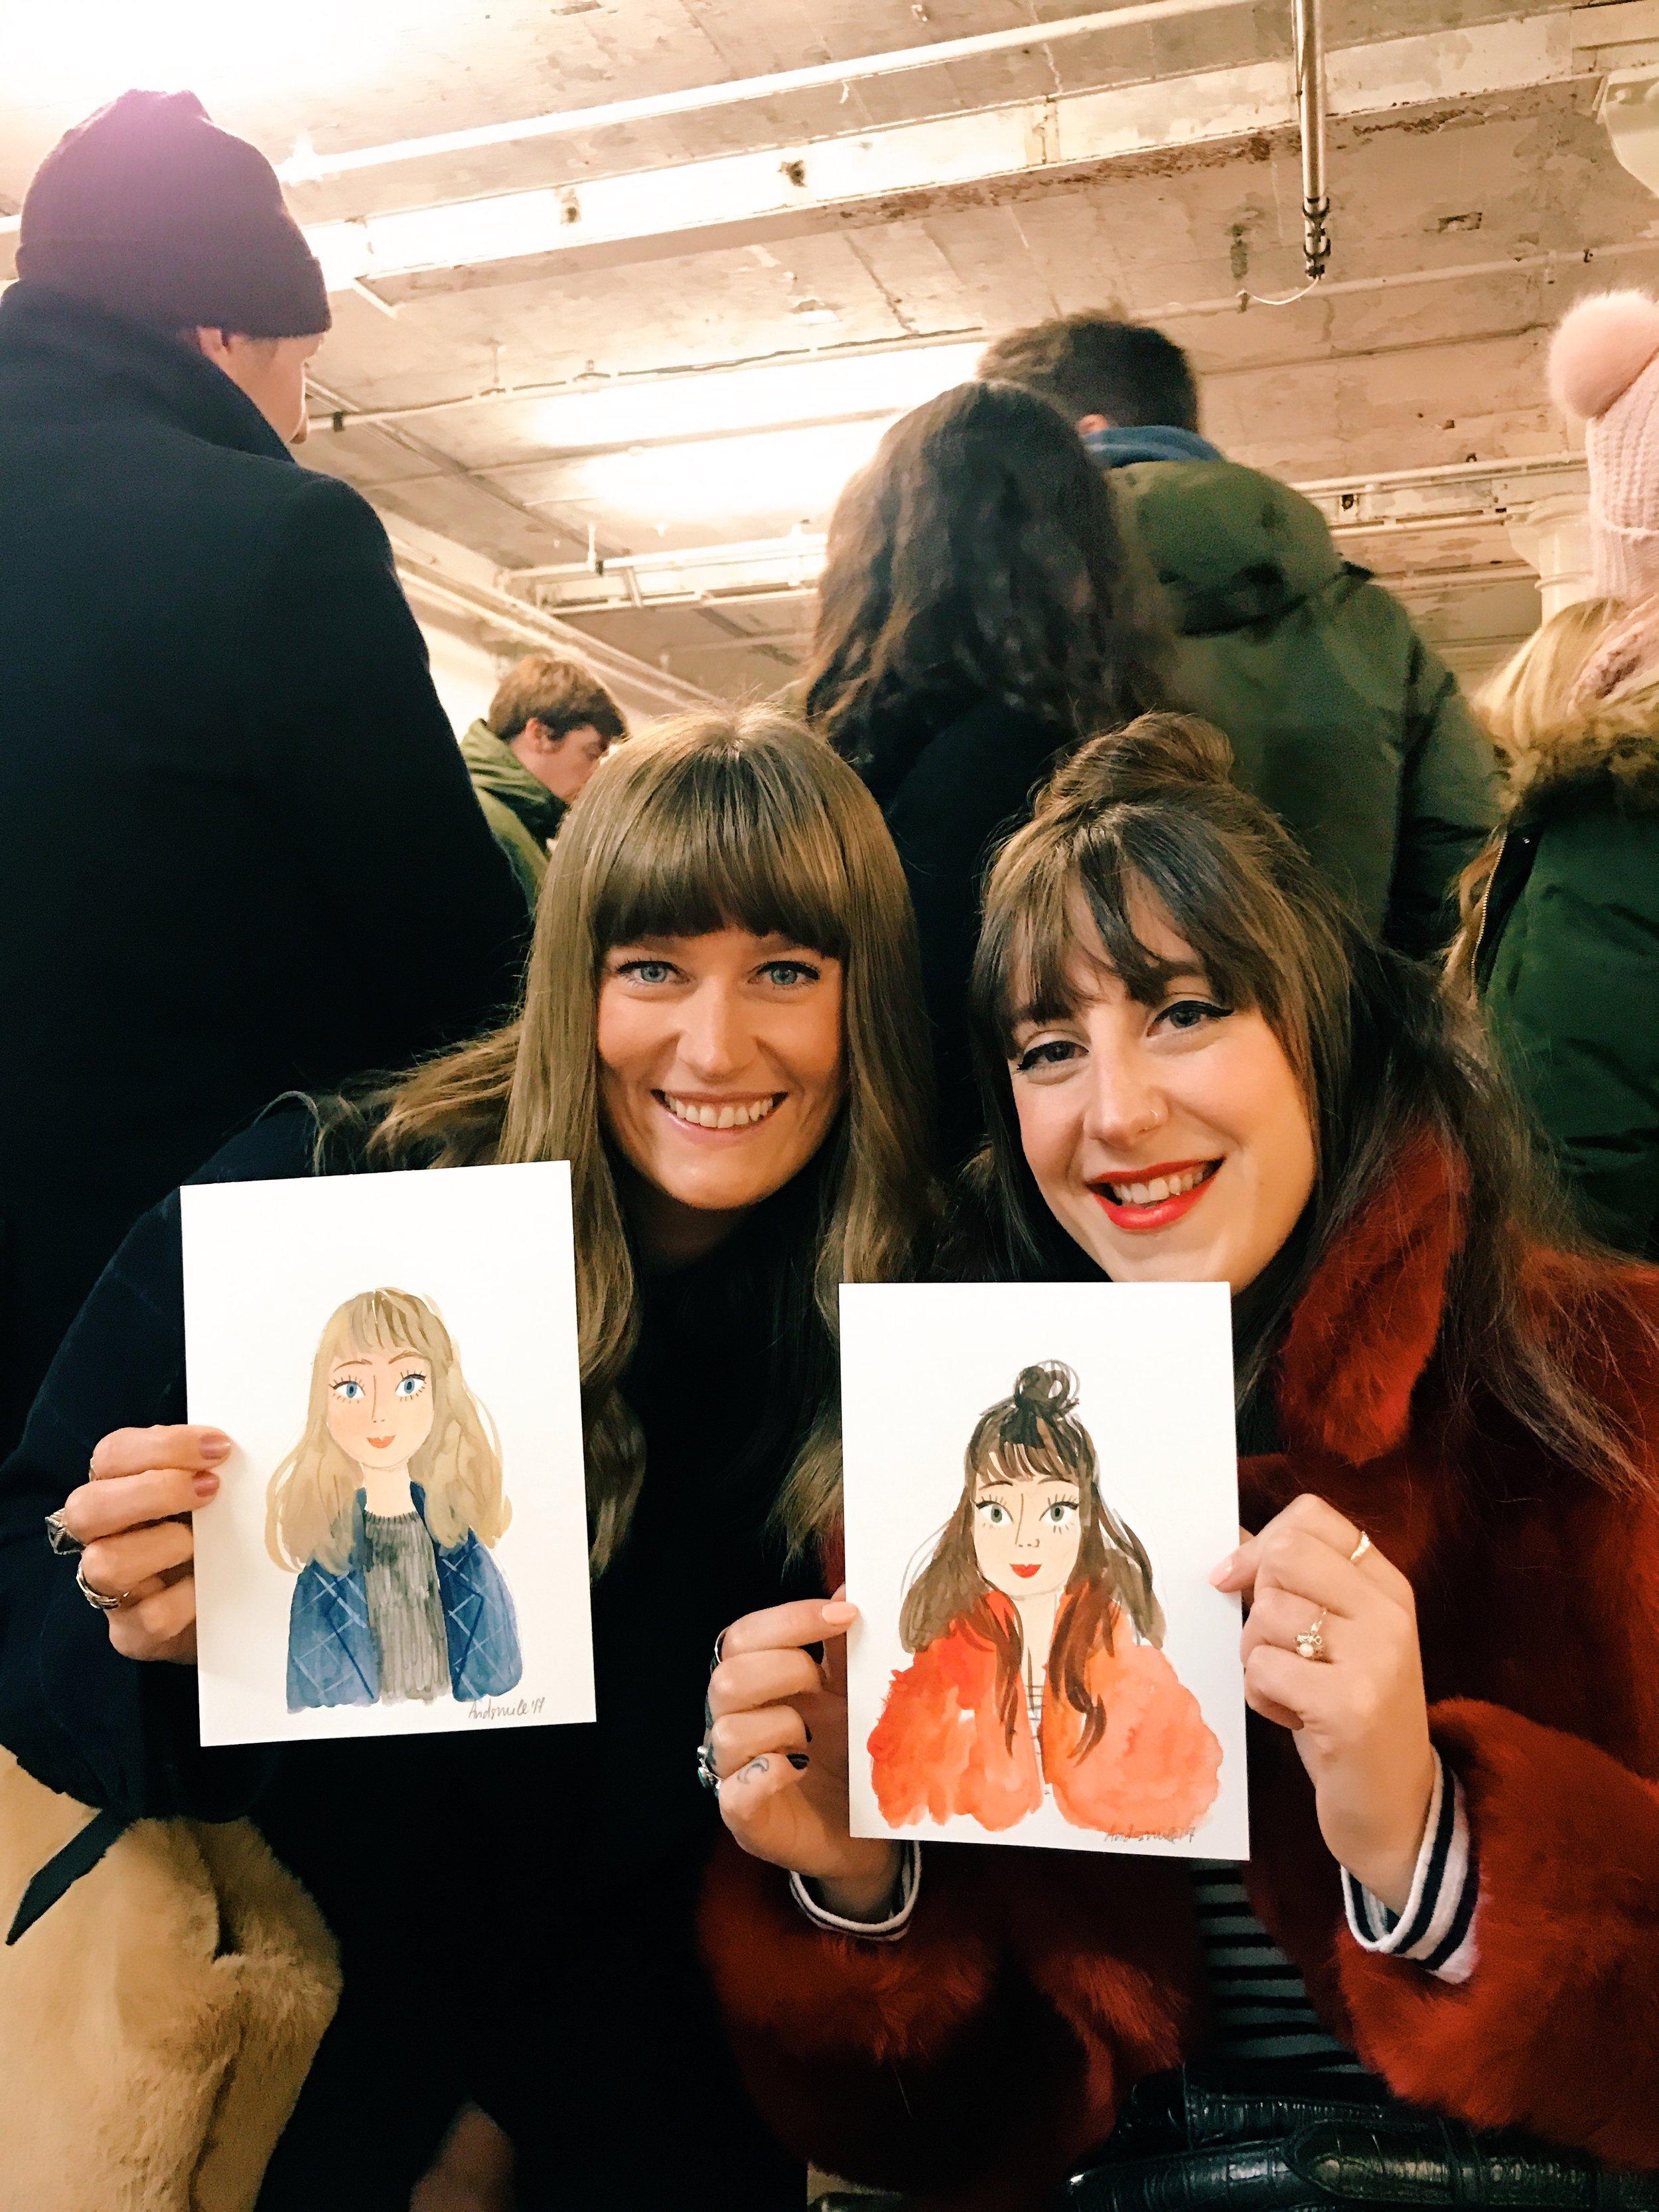 Viktorija Semjonova Live Illustration - Live Portraits at Crafty Fox